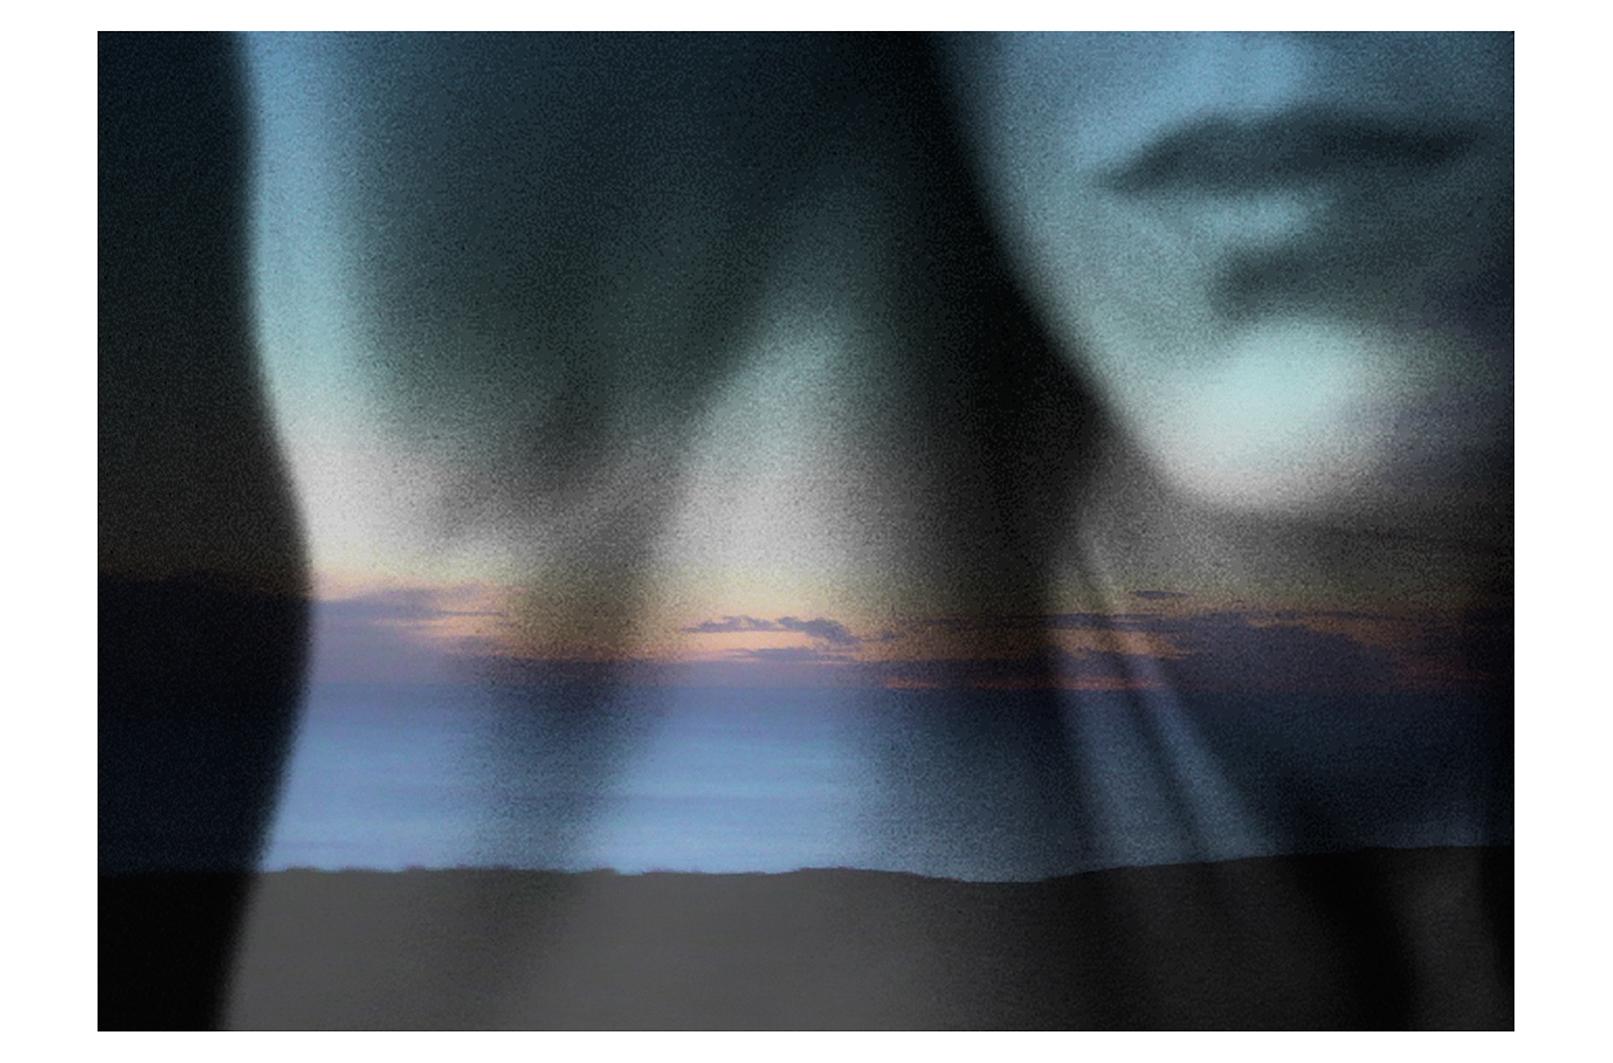 Tierra Imaginada #8, 2003-11       Archival Pigmented Print 10 x 8 inches